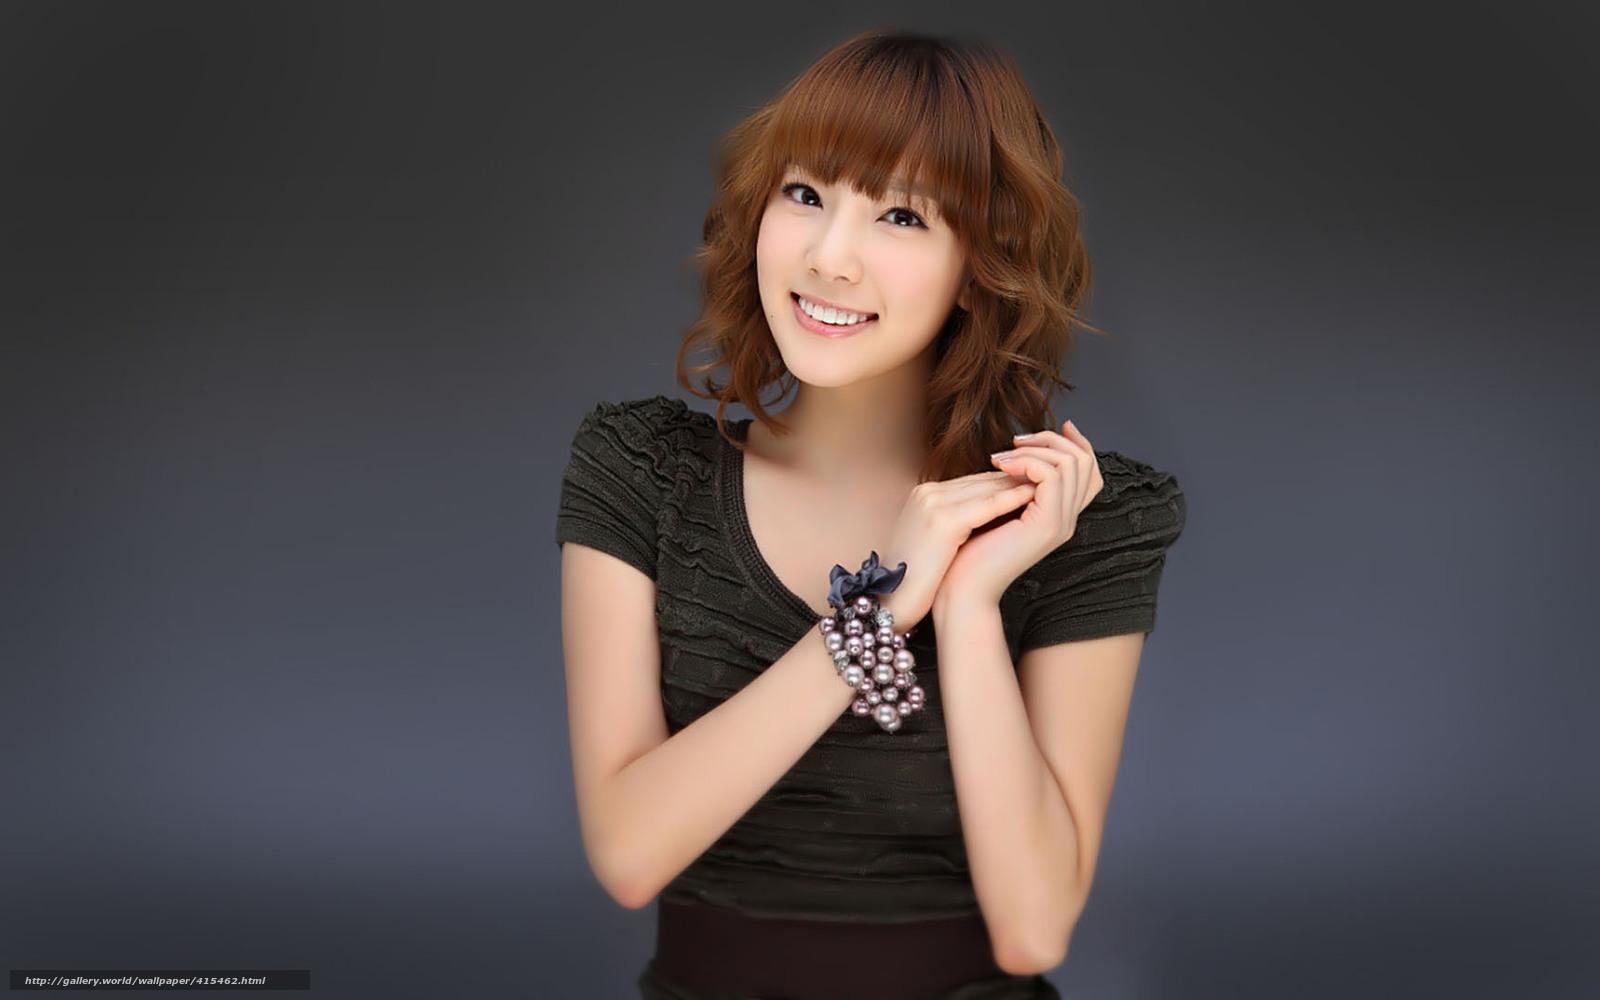 Смотреть онлайн фото кореянок 8 фотография